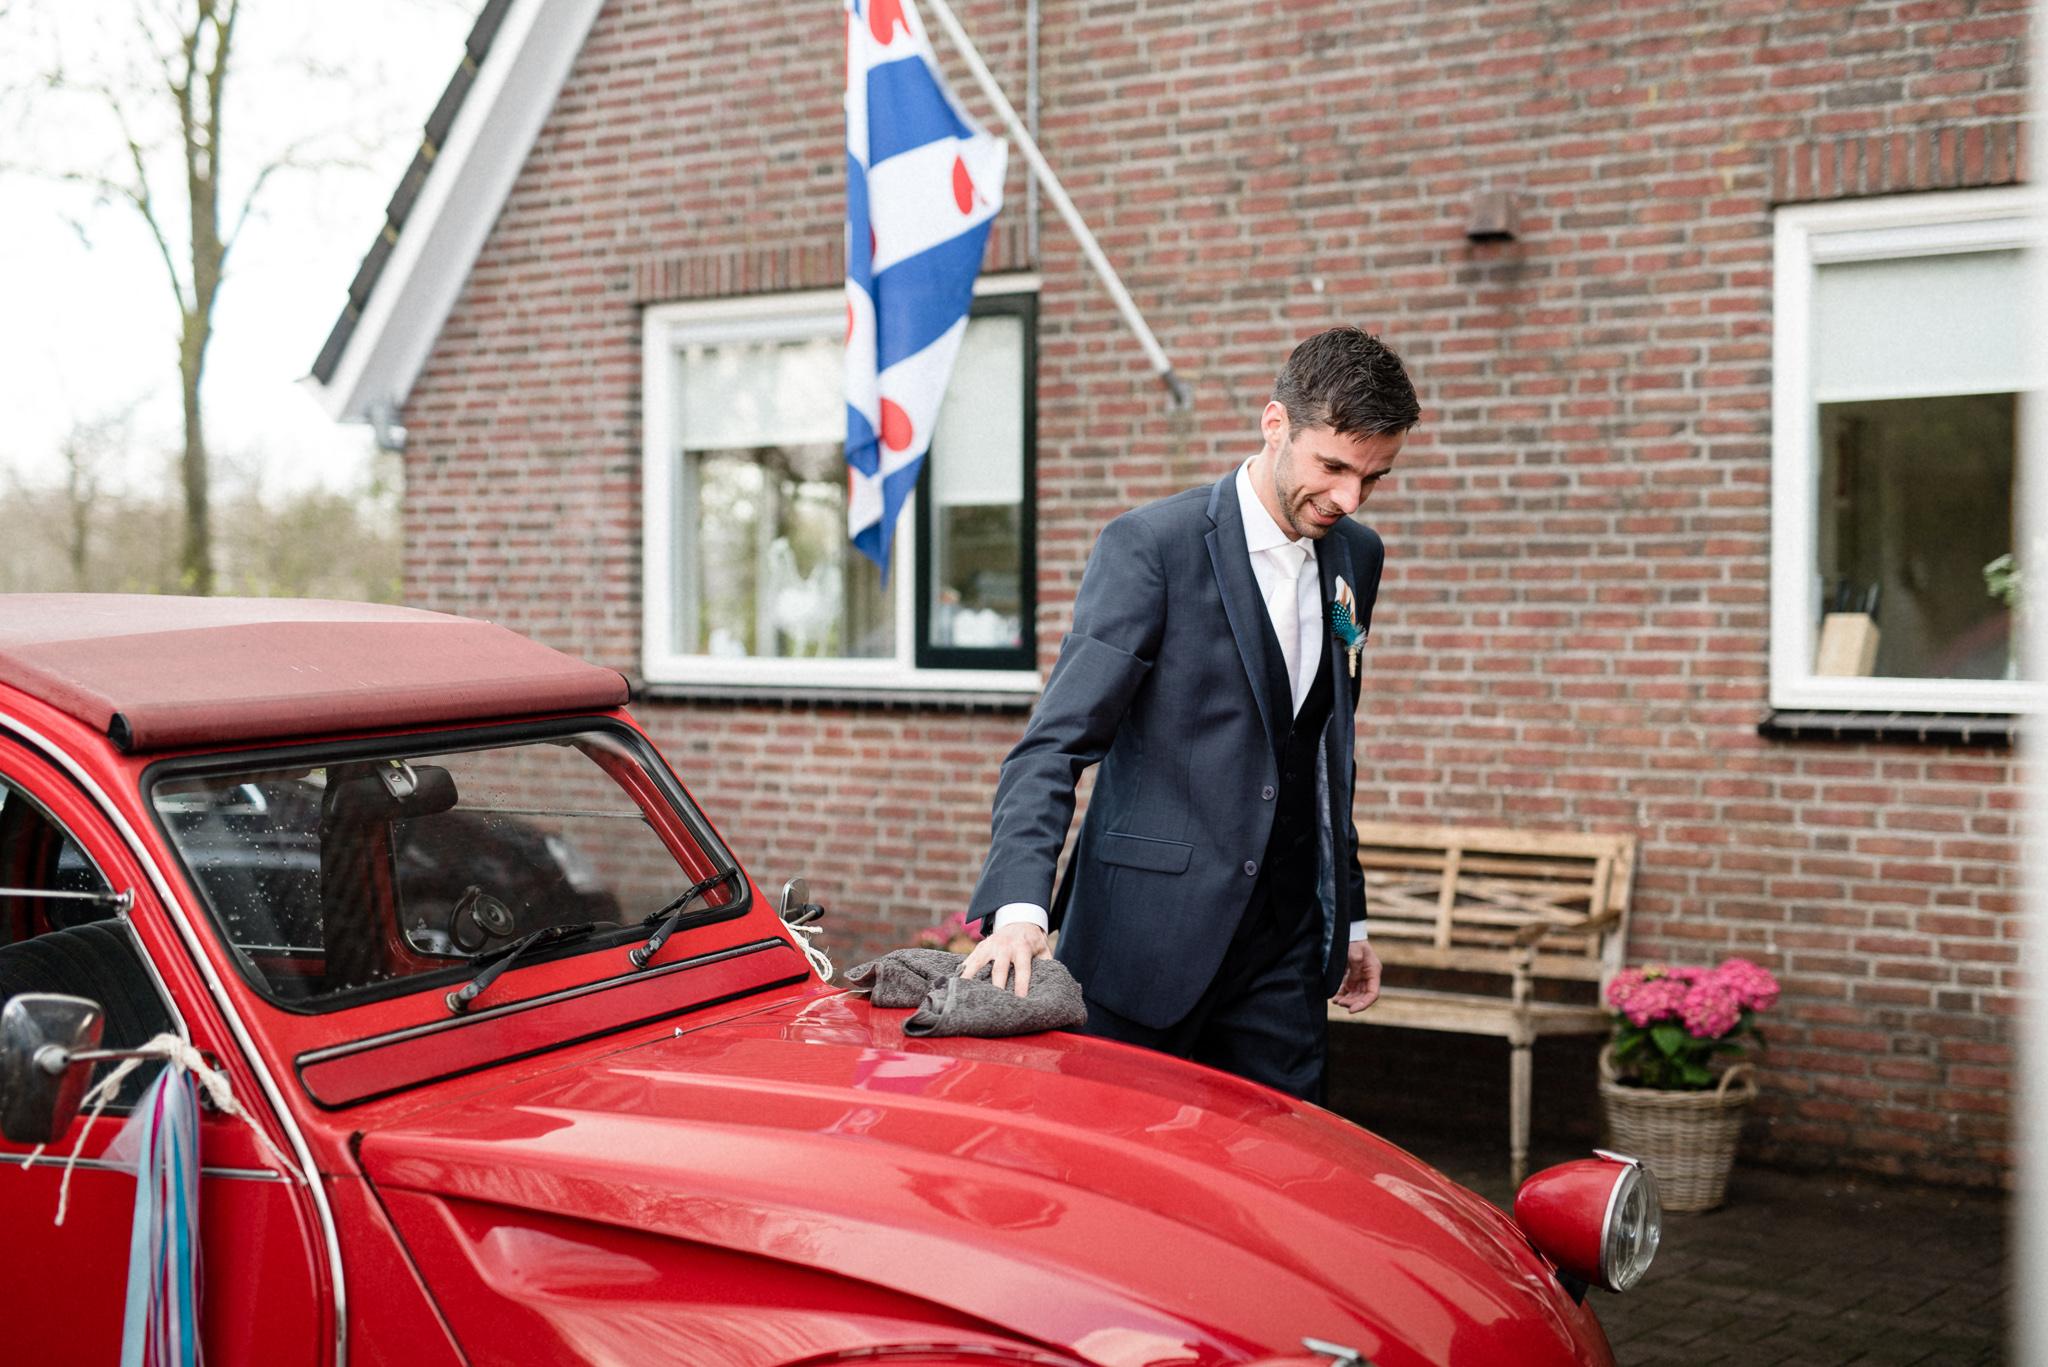 09 van 51 - trouwfotografie-gelske-reinier-friesland - 9786